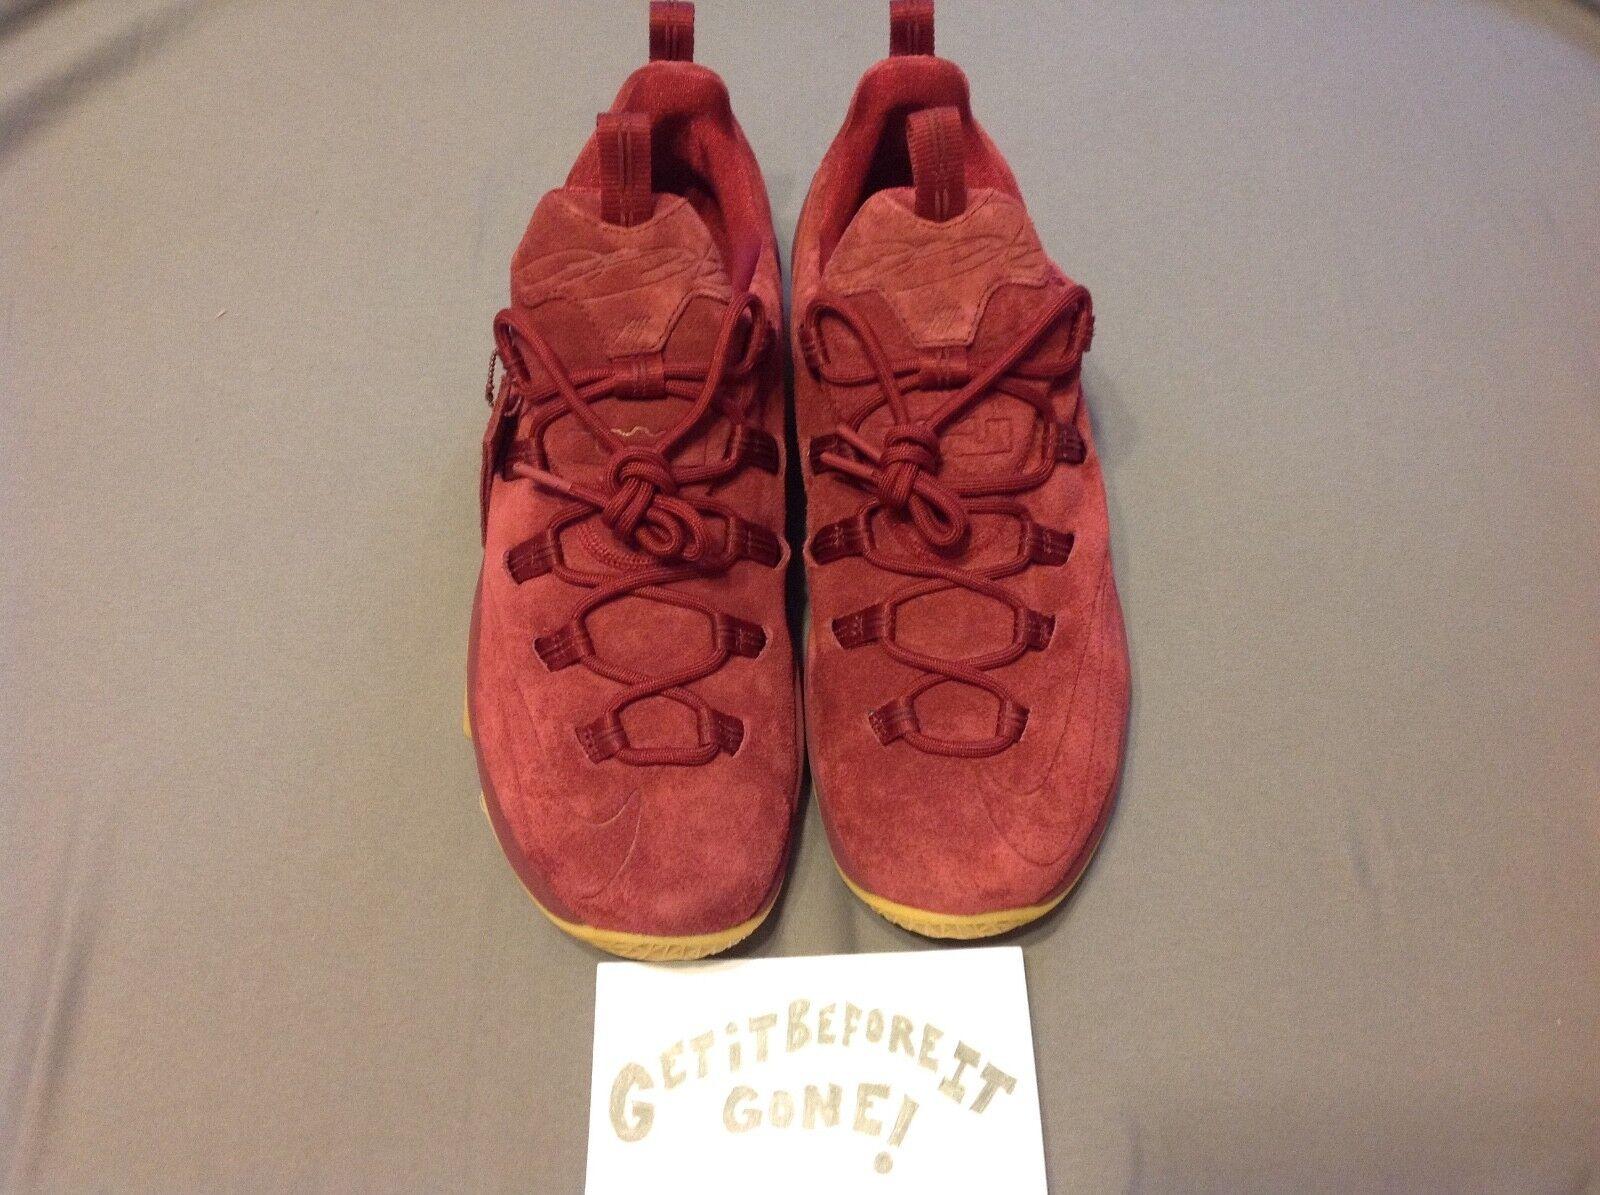 quality design b1b94 9255f (SZ 11.5) Nike Lebron XIII Low PRM Shoes (AH8289 (AH8289 (AH8289